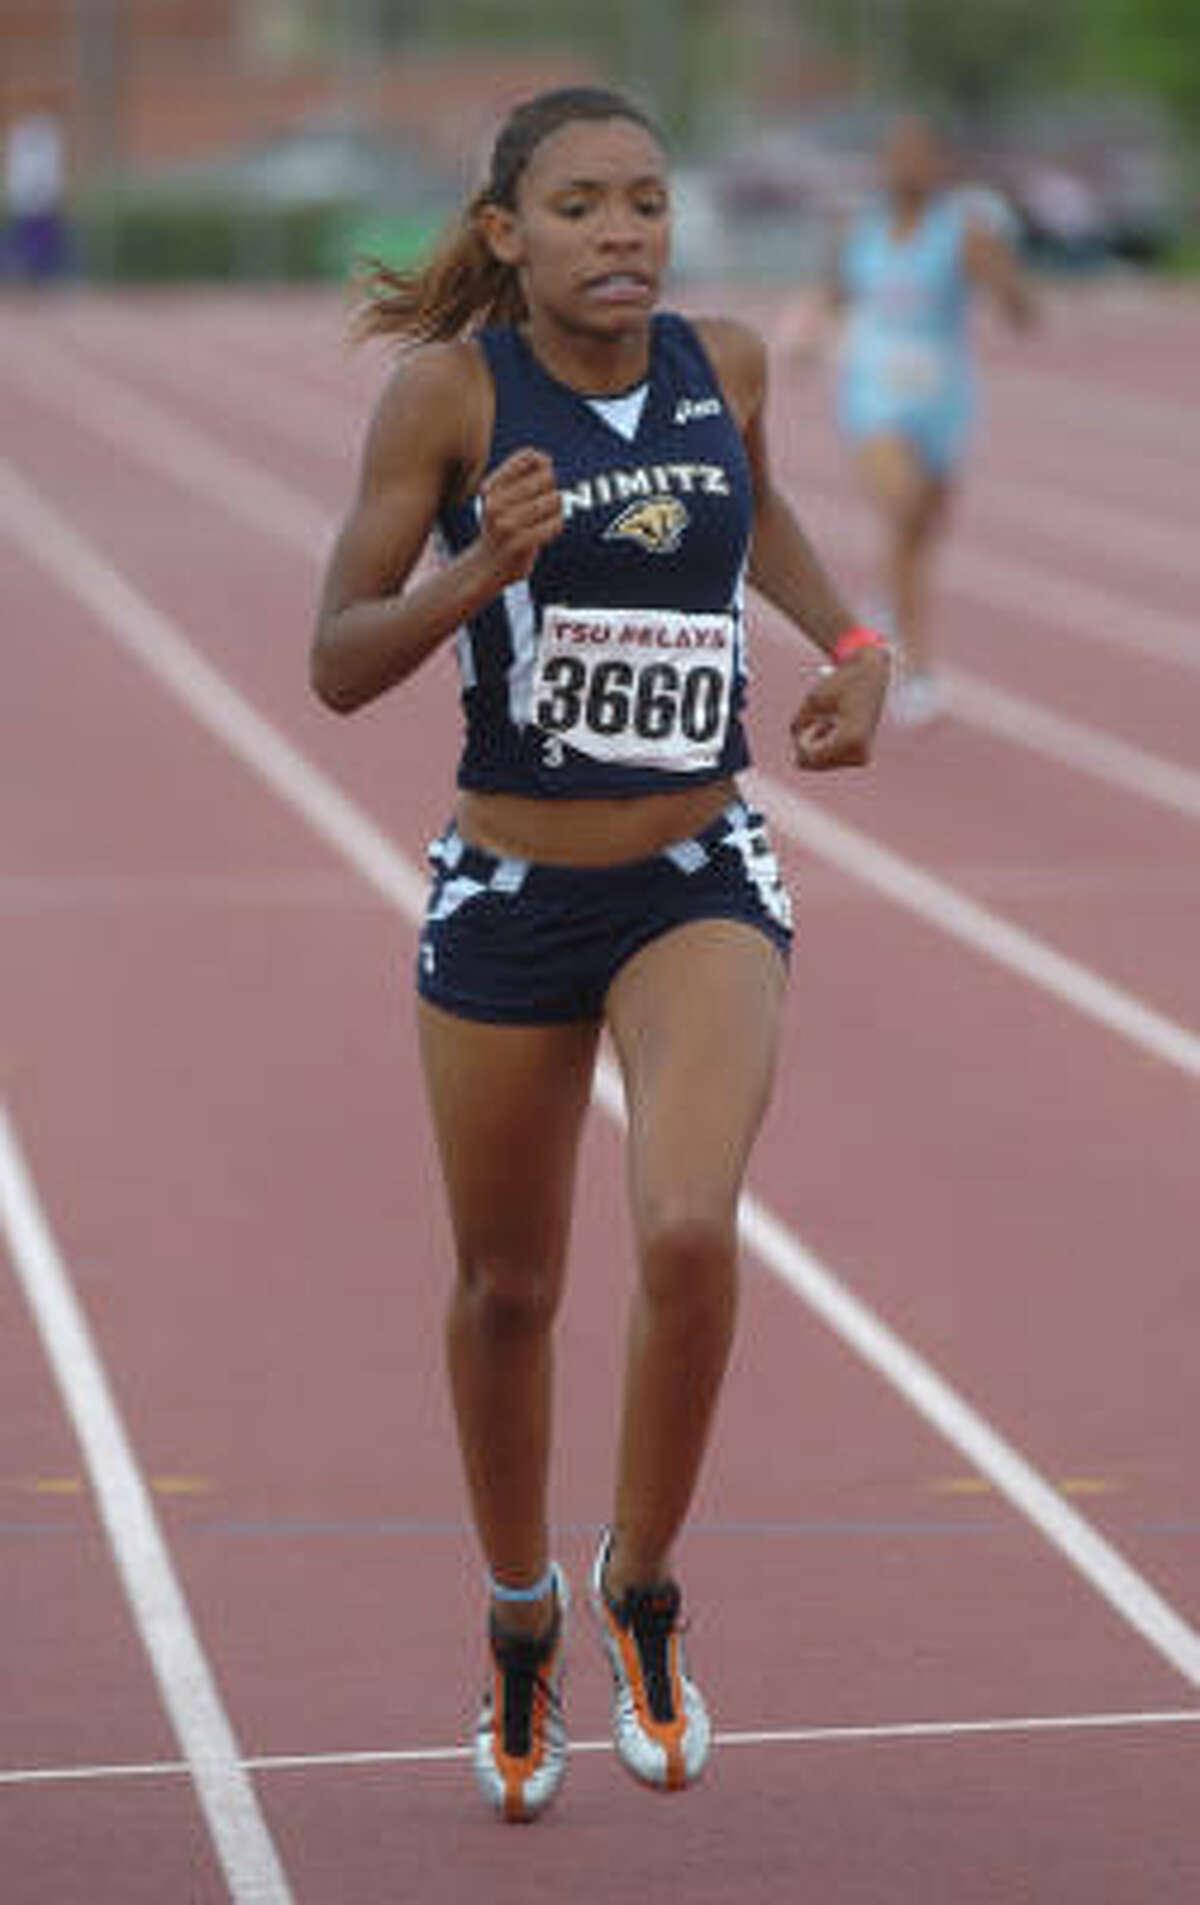 LaShunda Phipps of Nimitz competes in the 400-meter dash.